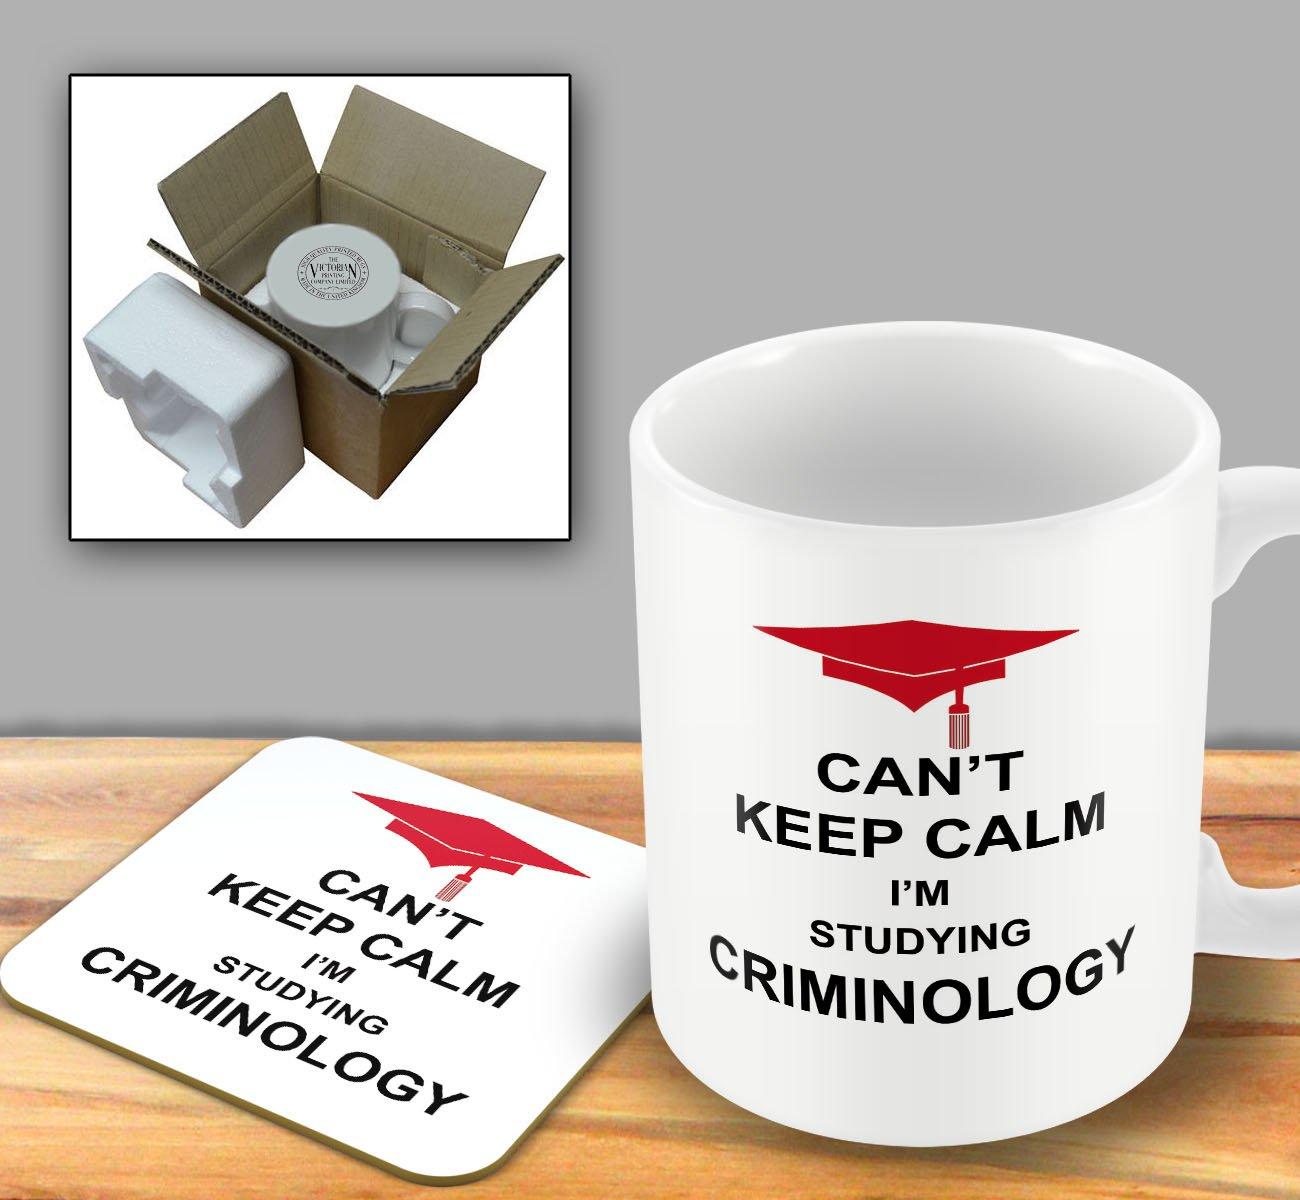 Can't Keep Calm I'm Studying Criminology - Mug and Coaster Set